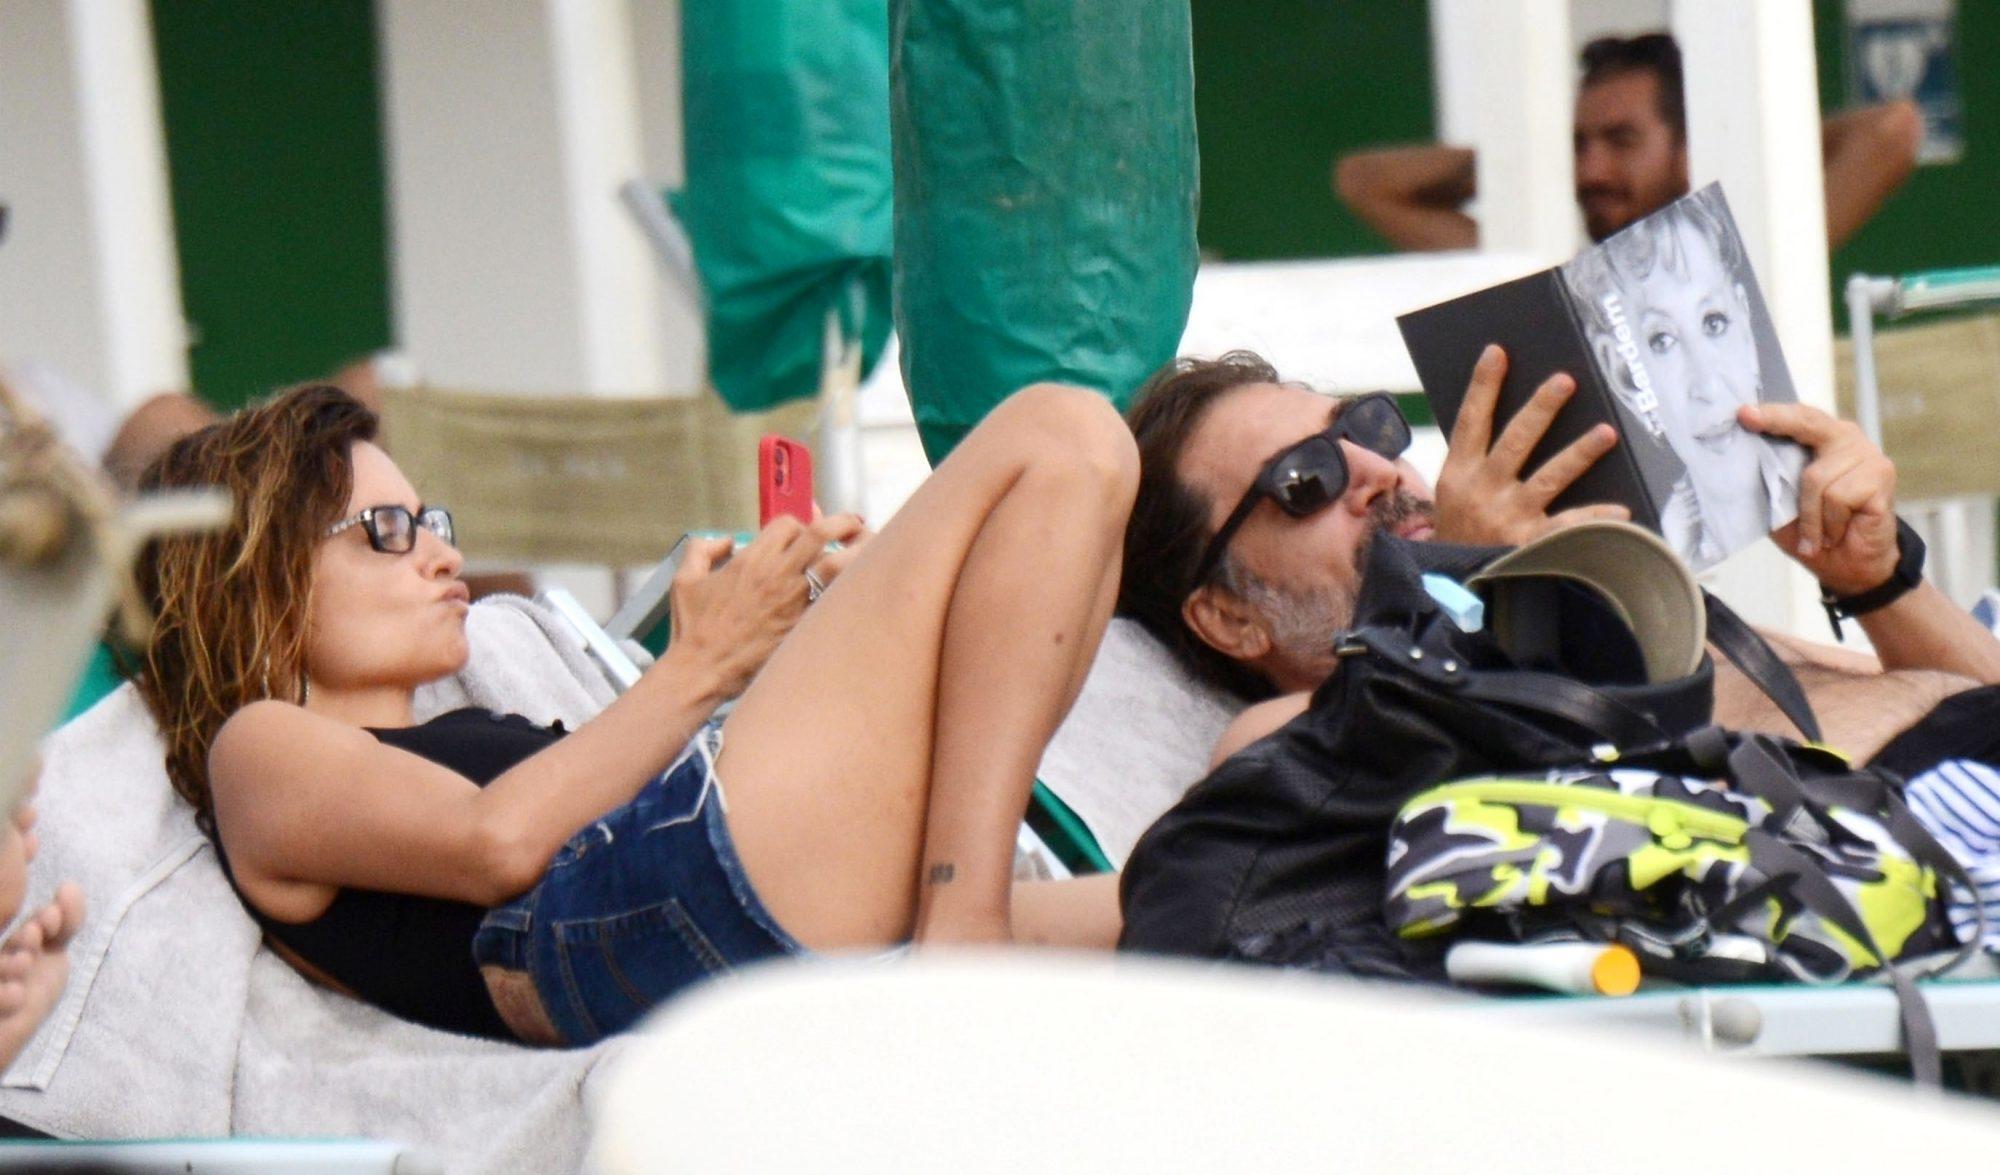 Penelope Cruz & Javier Bardem Seen Relaxing on Holiday with their Children in Fregene